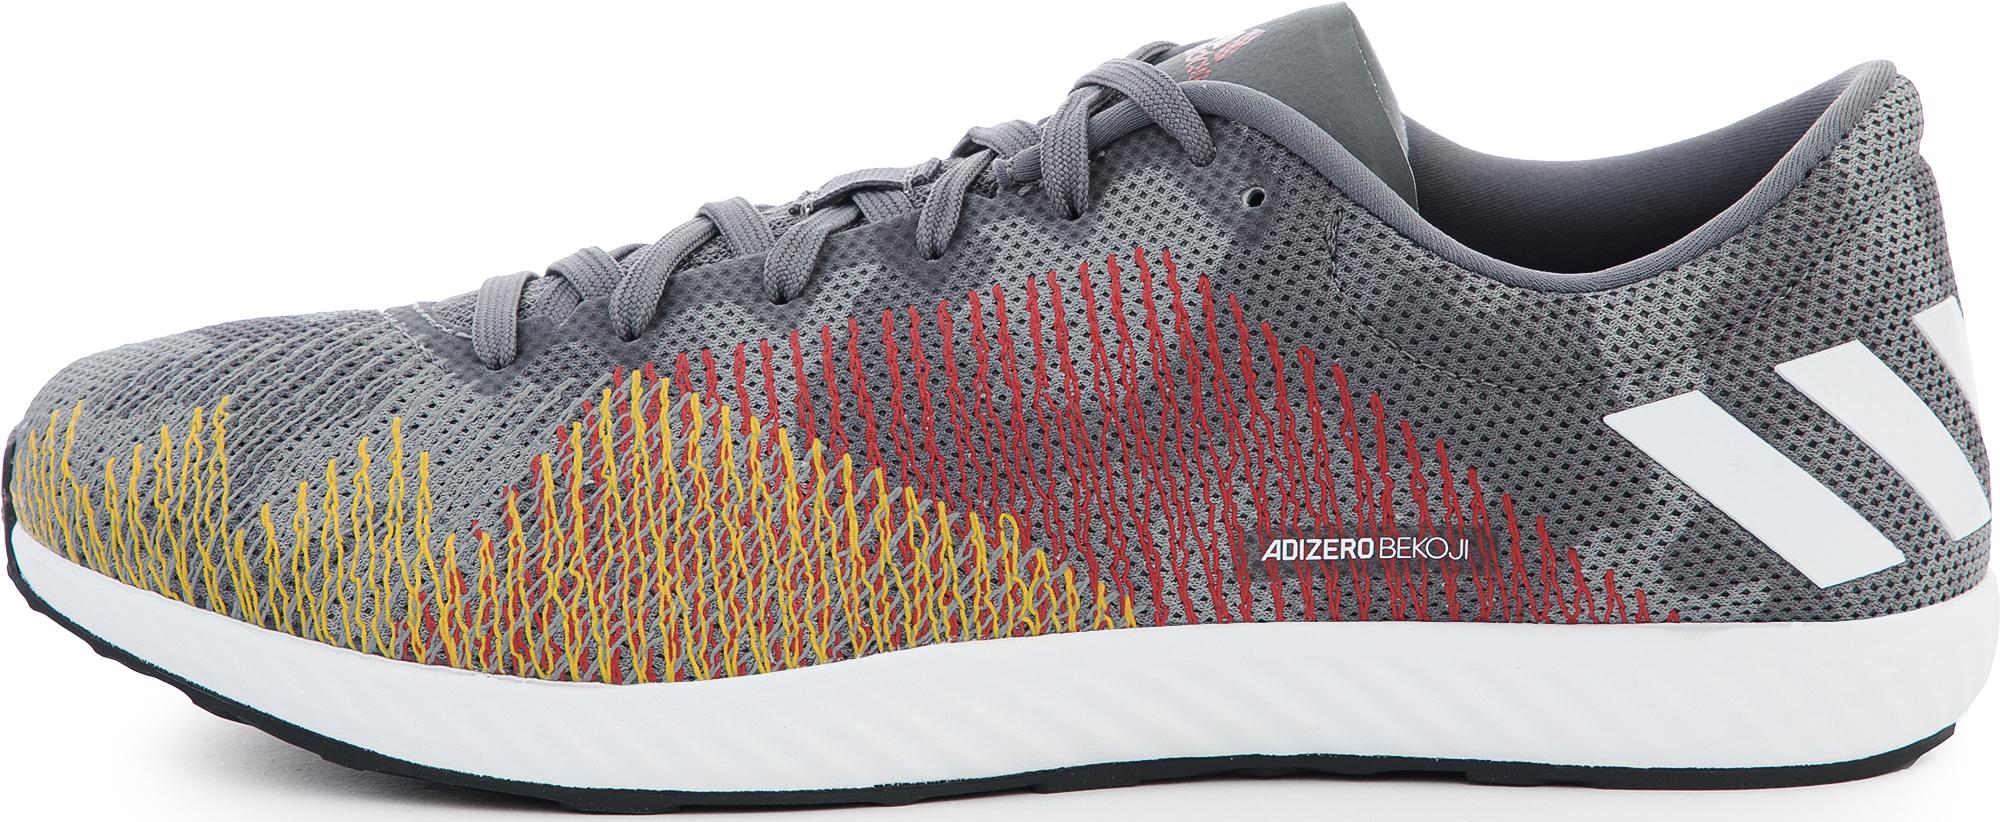 Adidas Кроссовки мужские Adizero Bekoji, размер 39